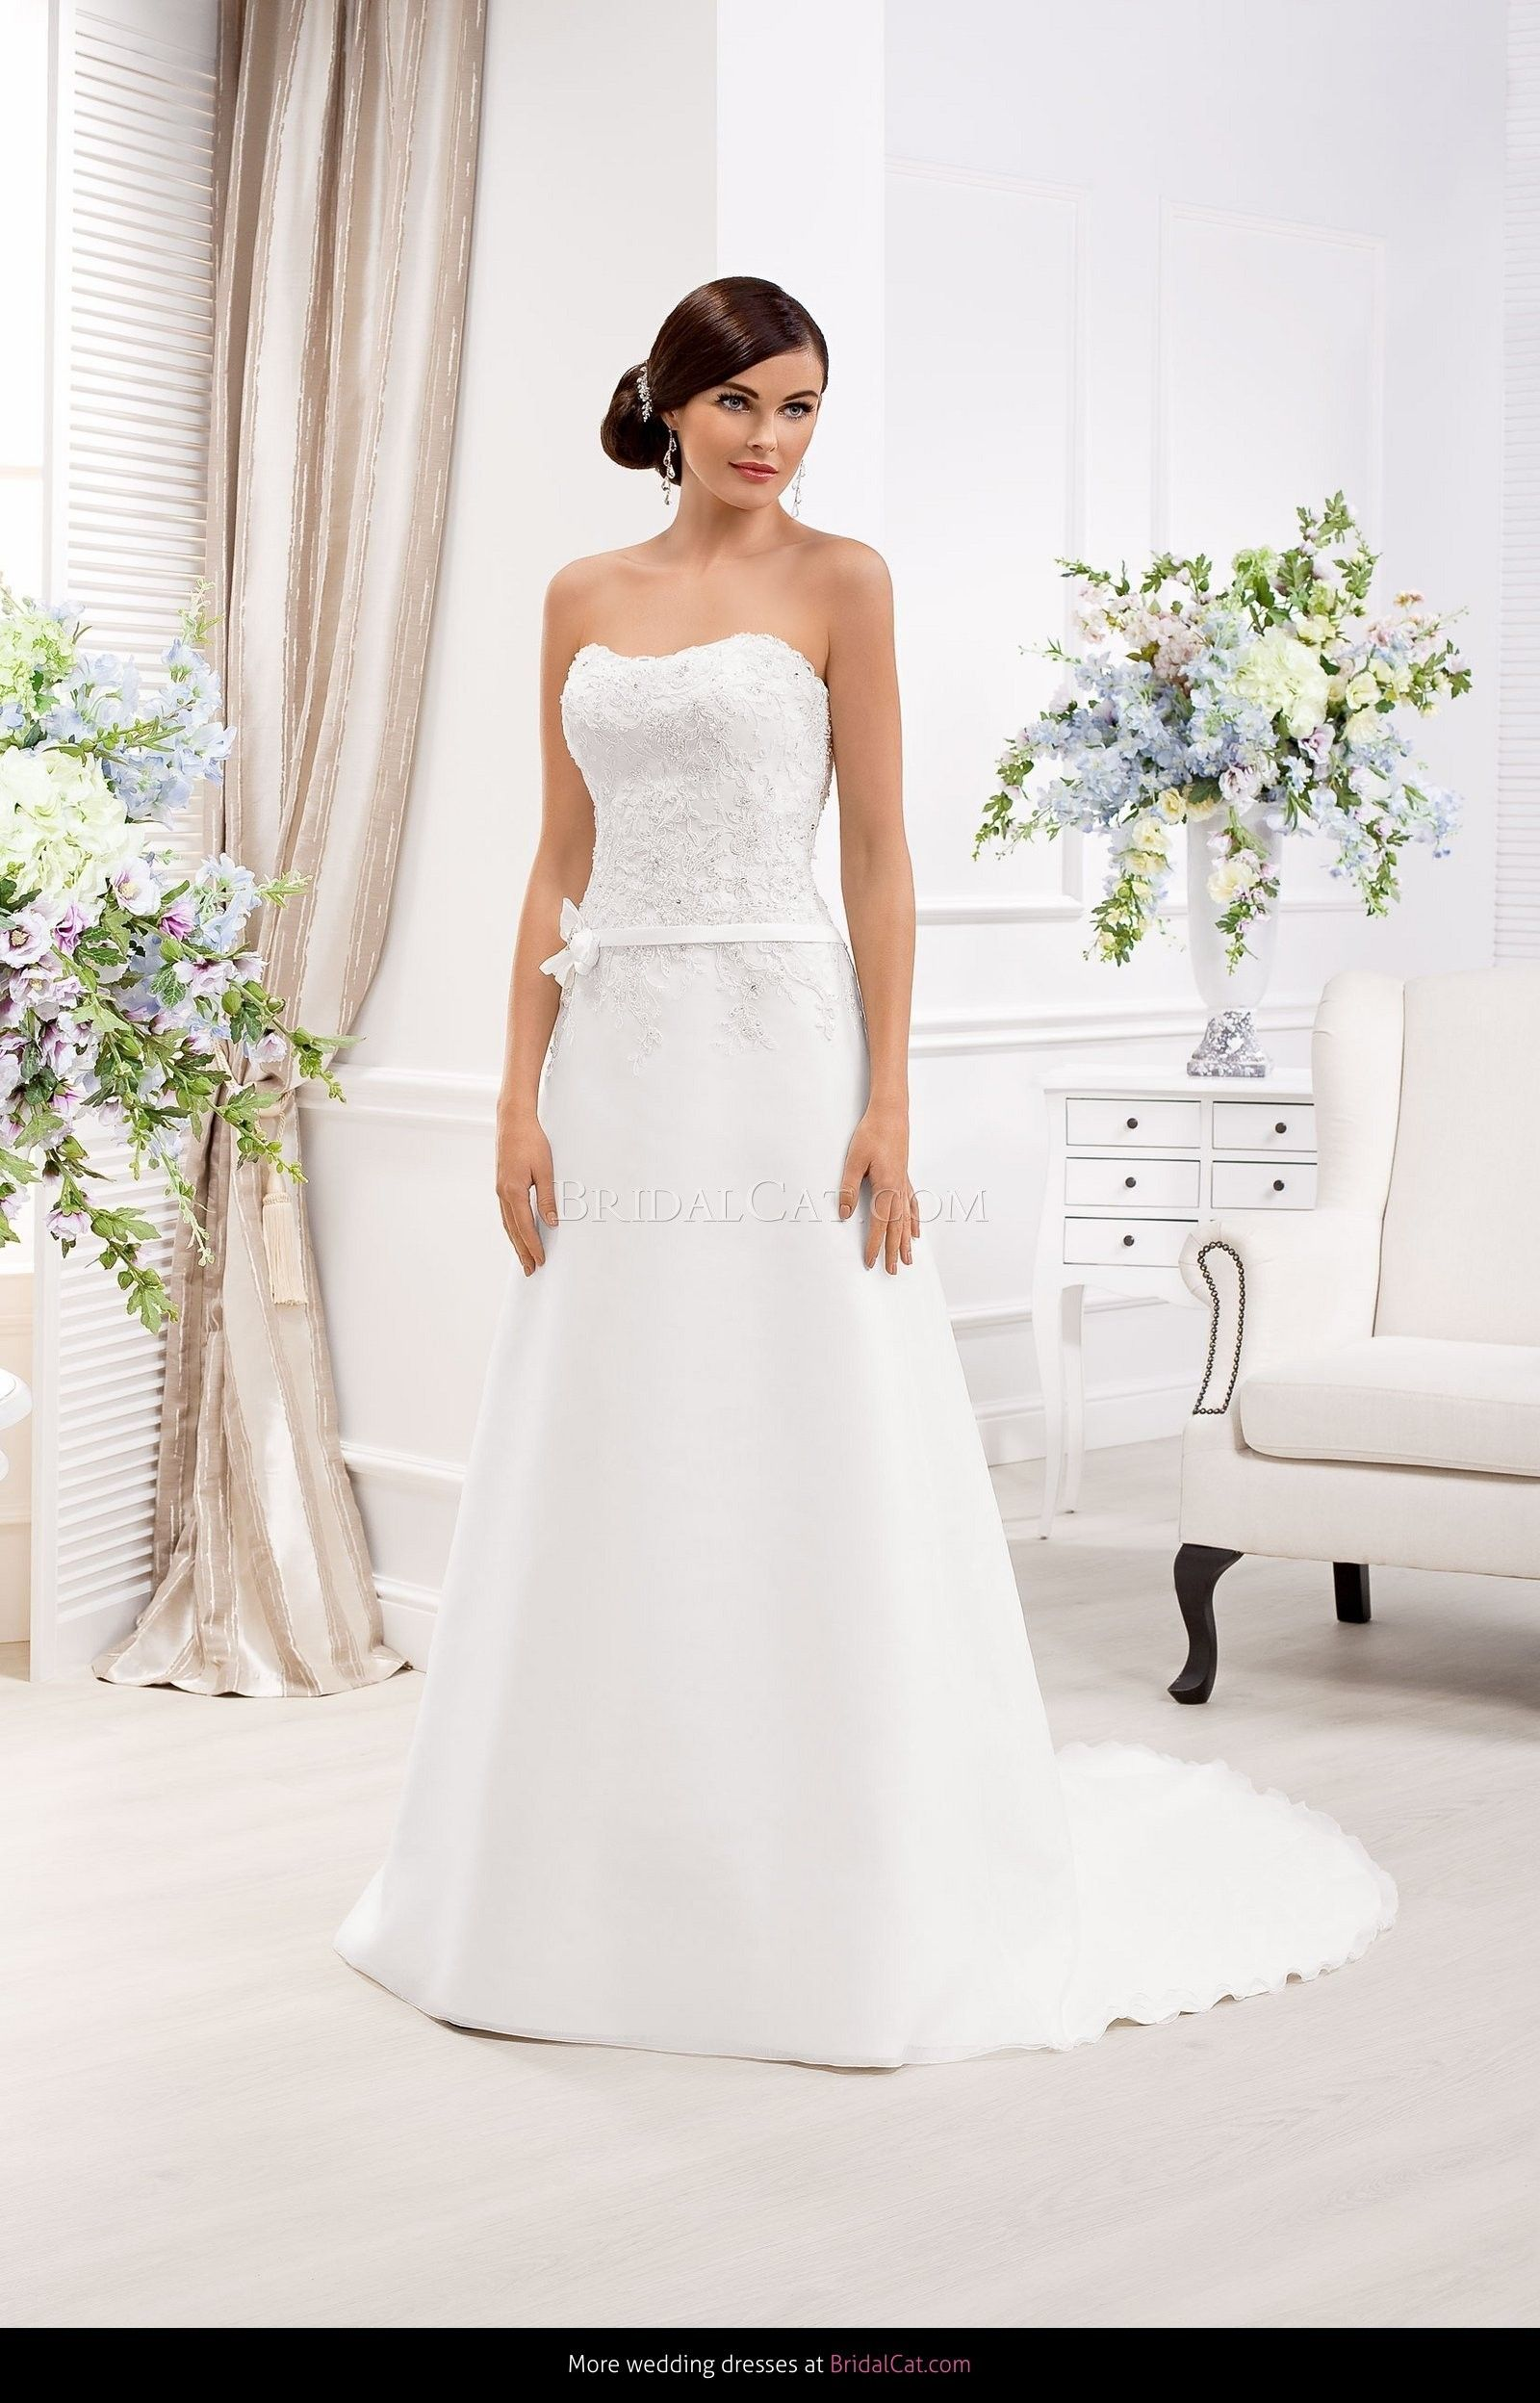 La sposa pandora wedding dress   ET  Elizabeth Passion  All New Bridals  Pinterest